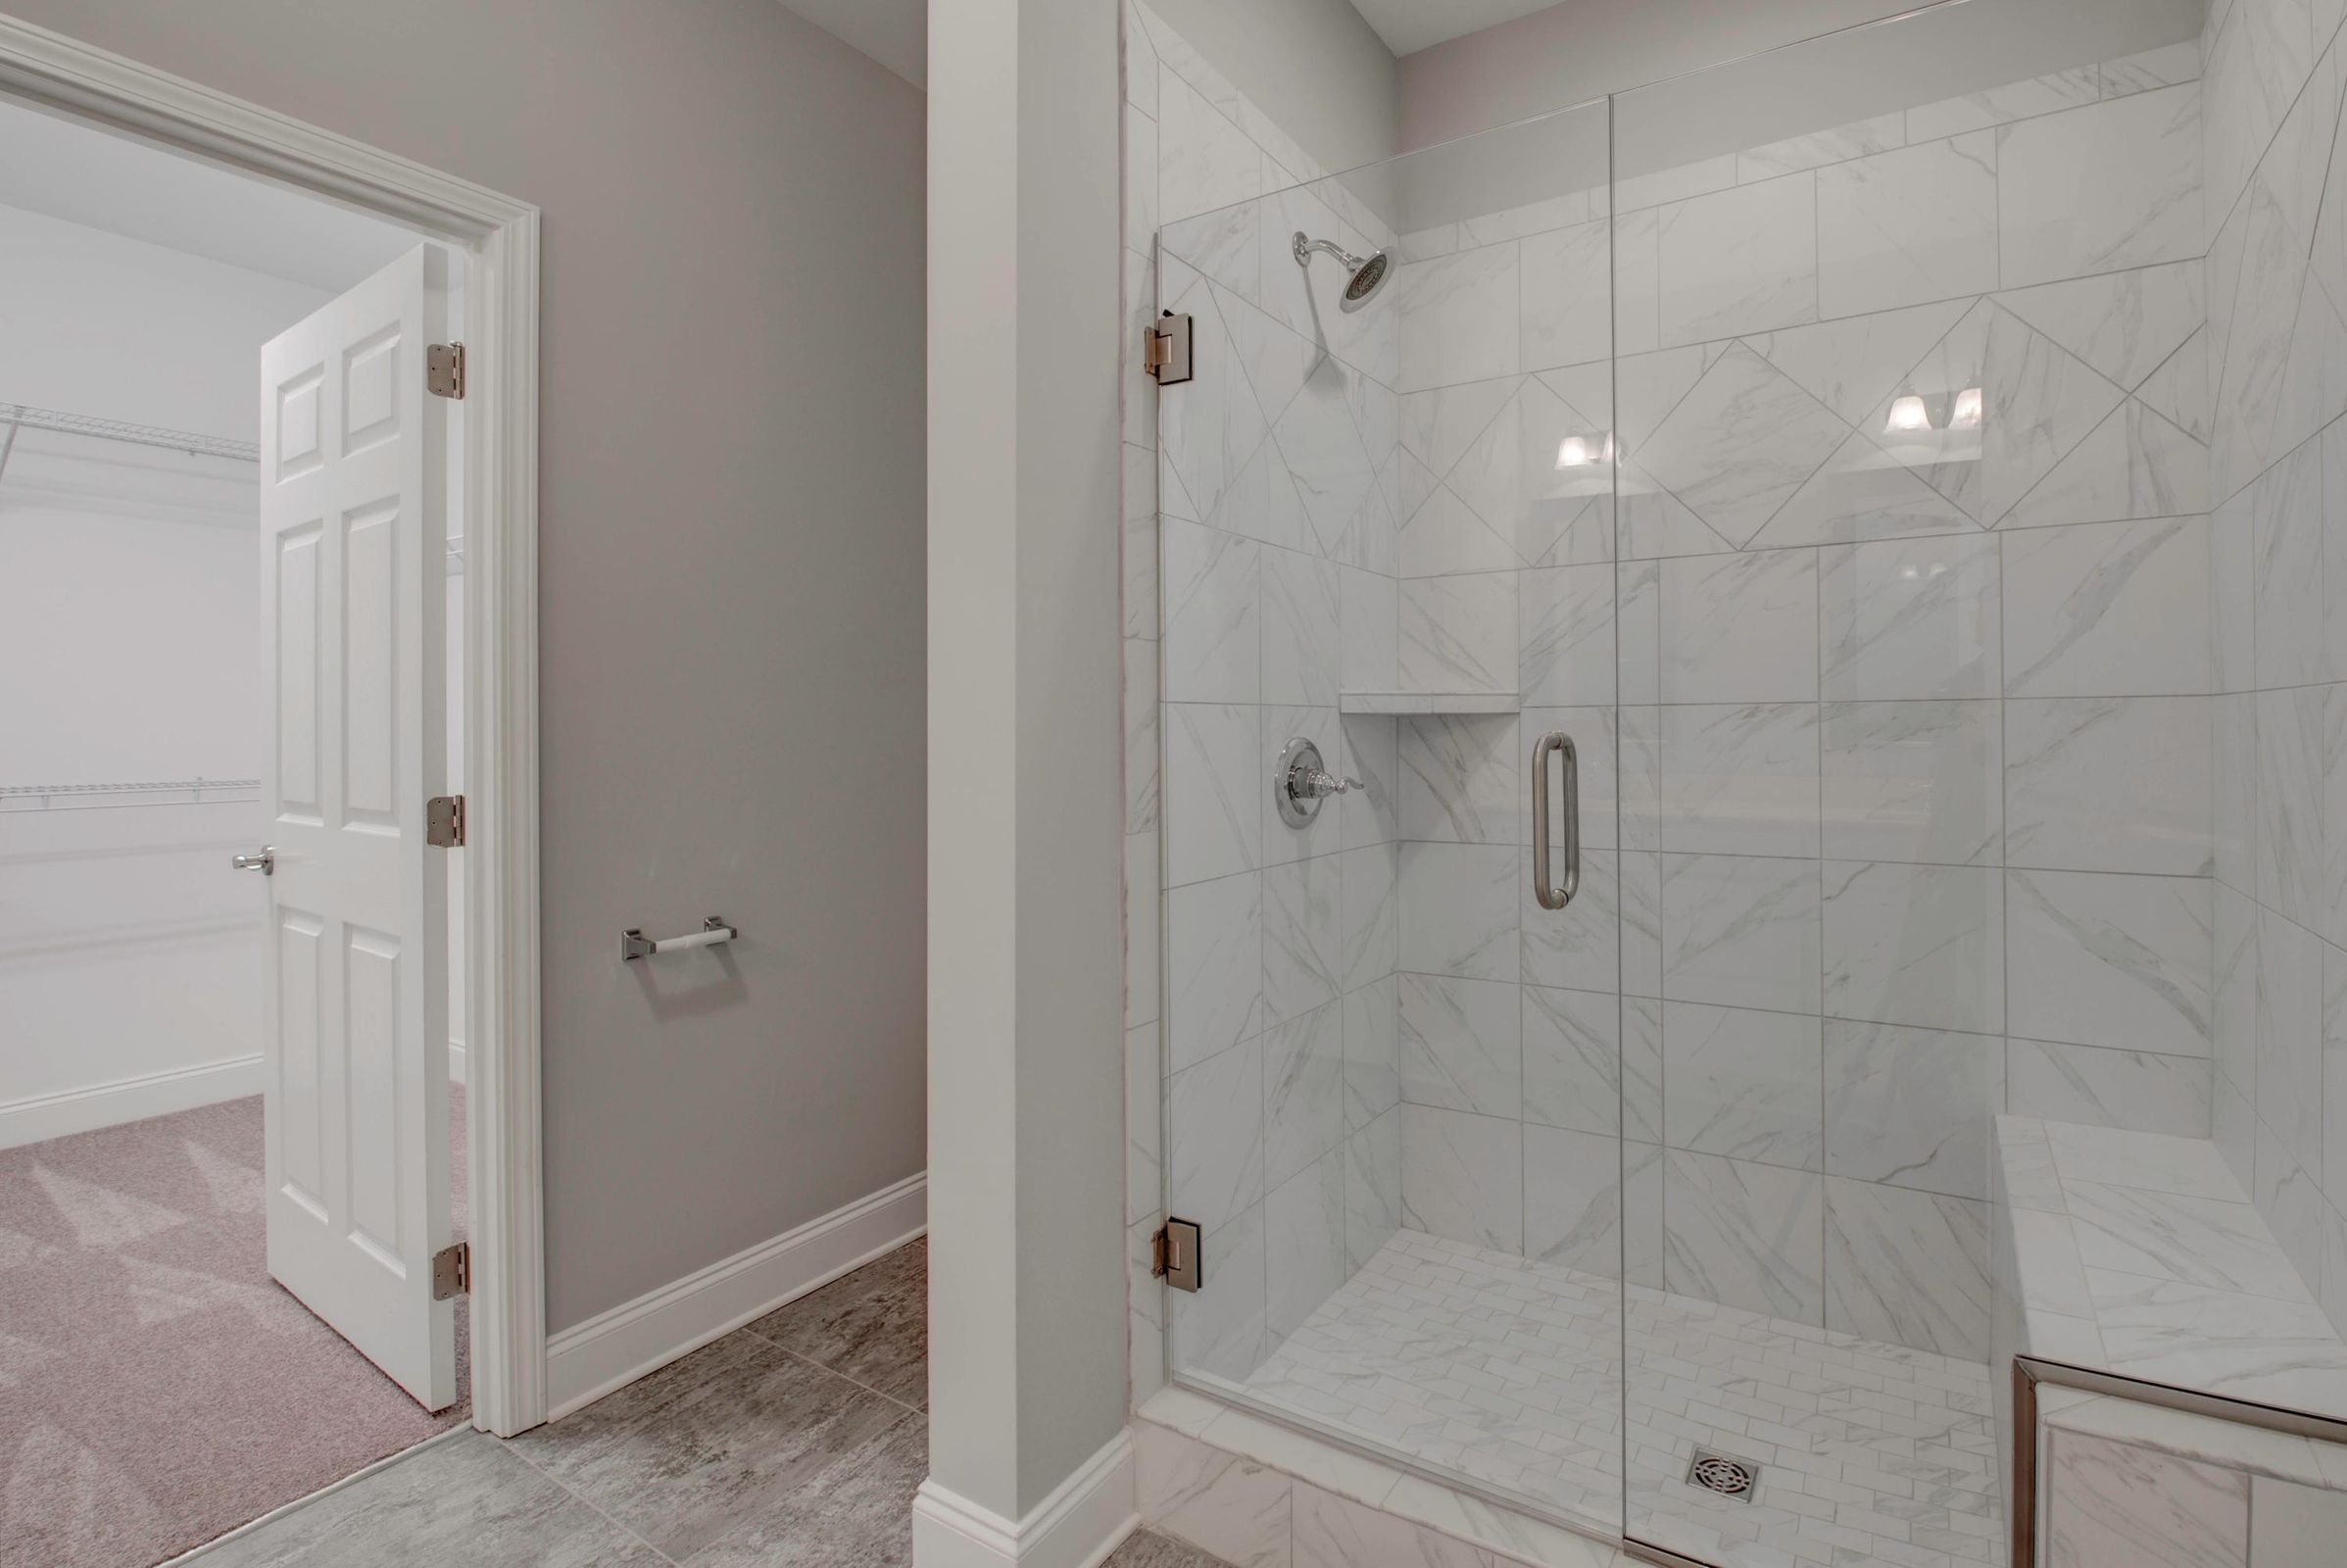 134 shower